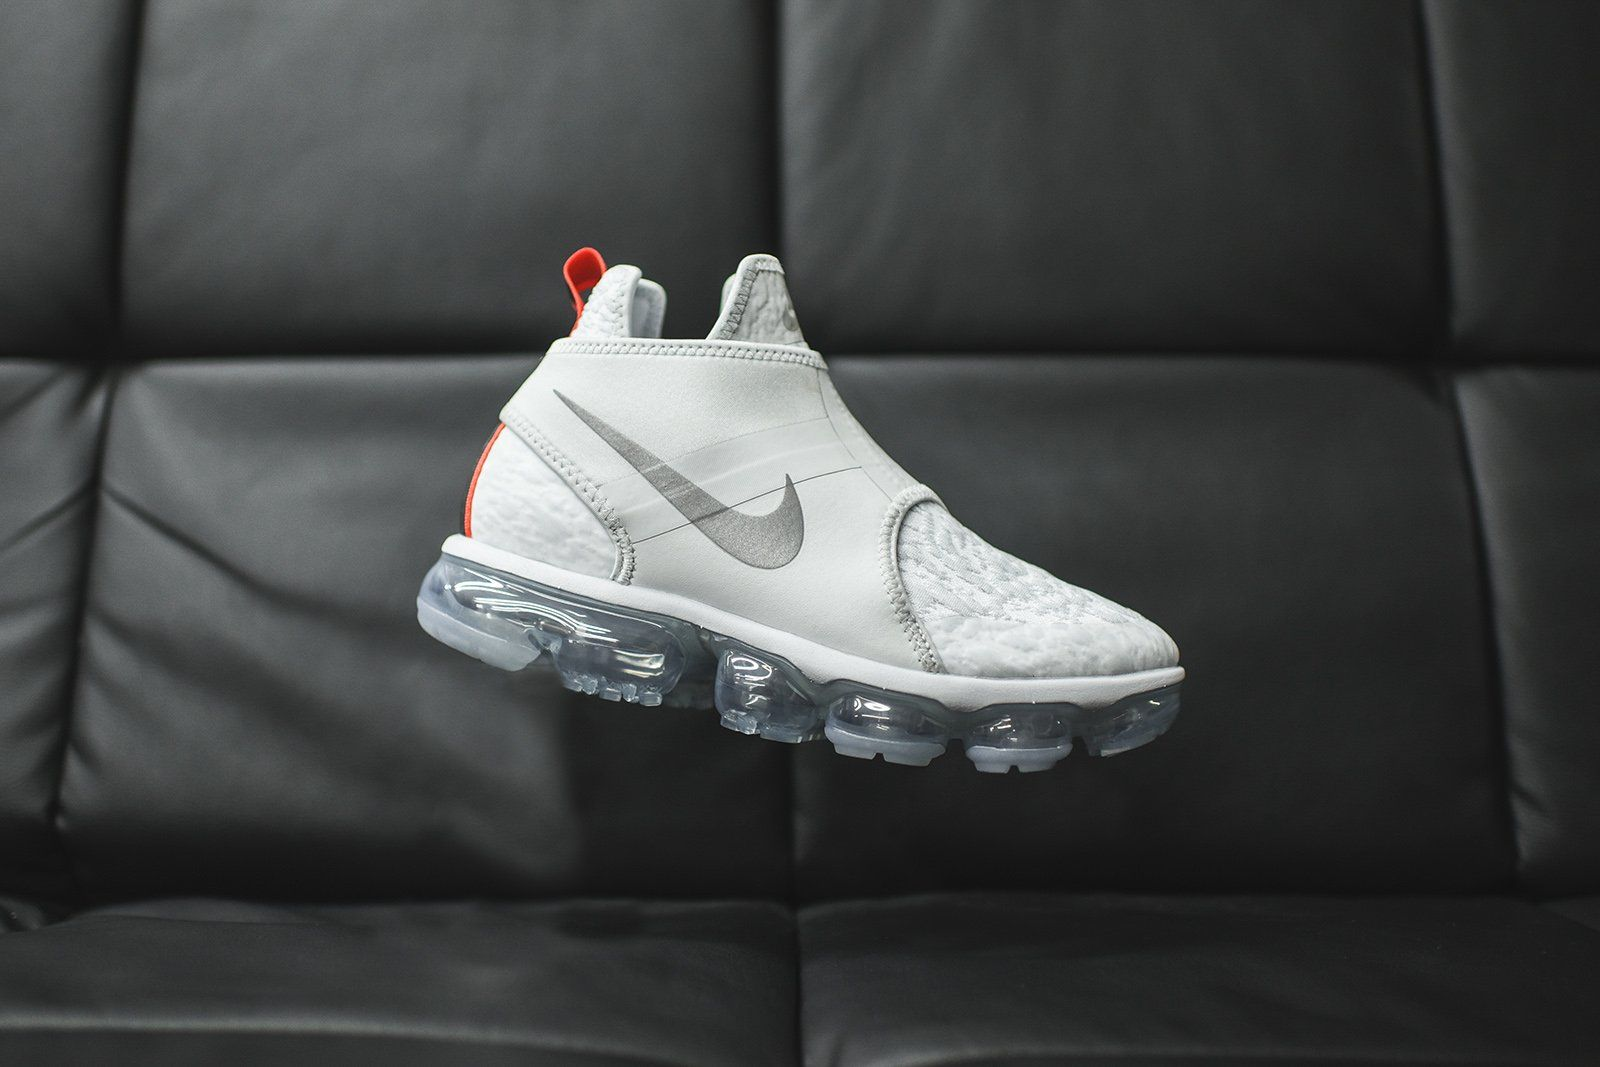 Nike Air VaporMax Chukka bianca    scarpe  bianca  Pinterest 9c90fd